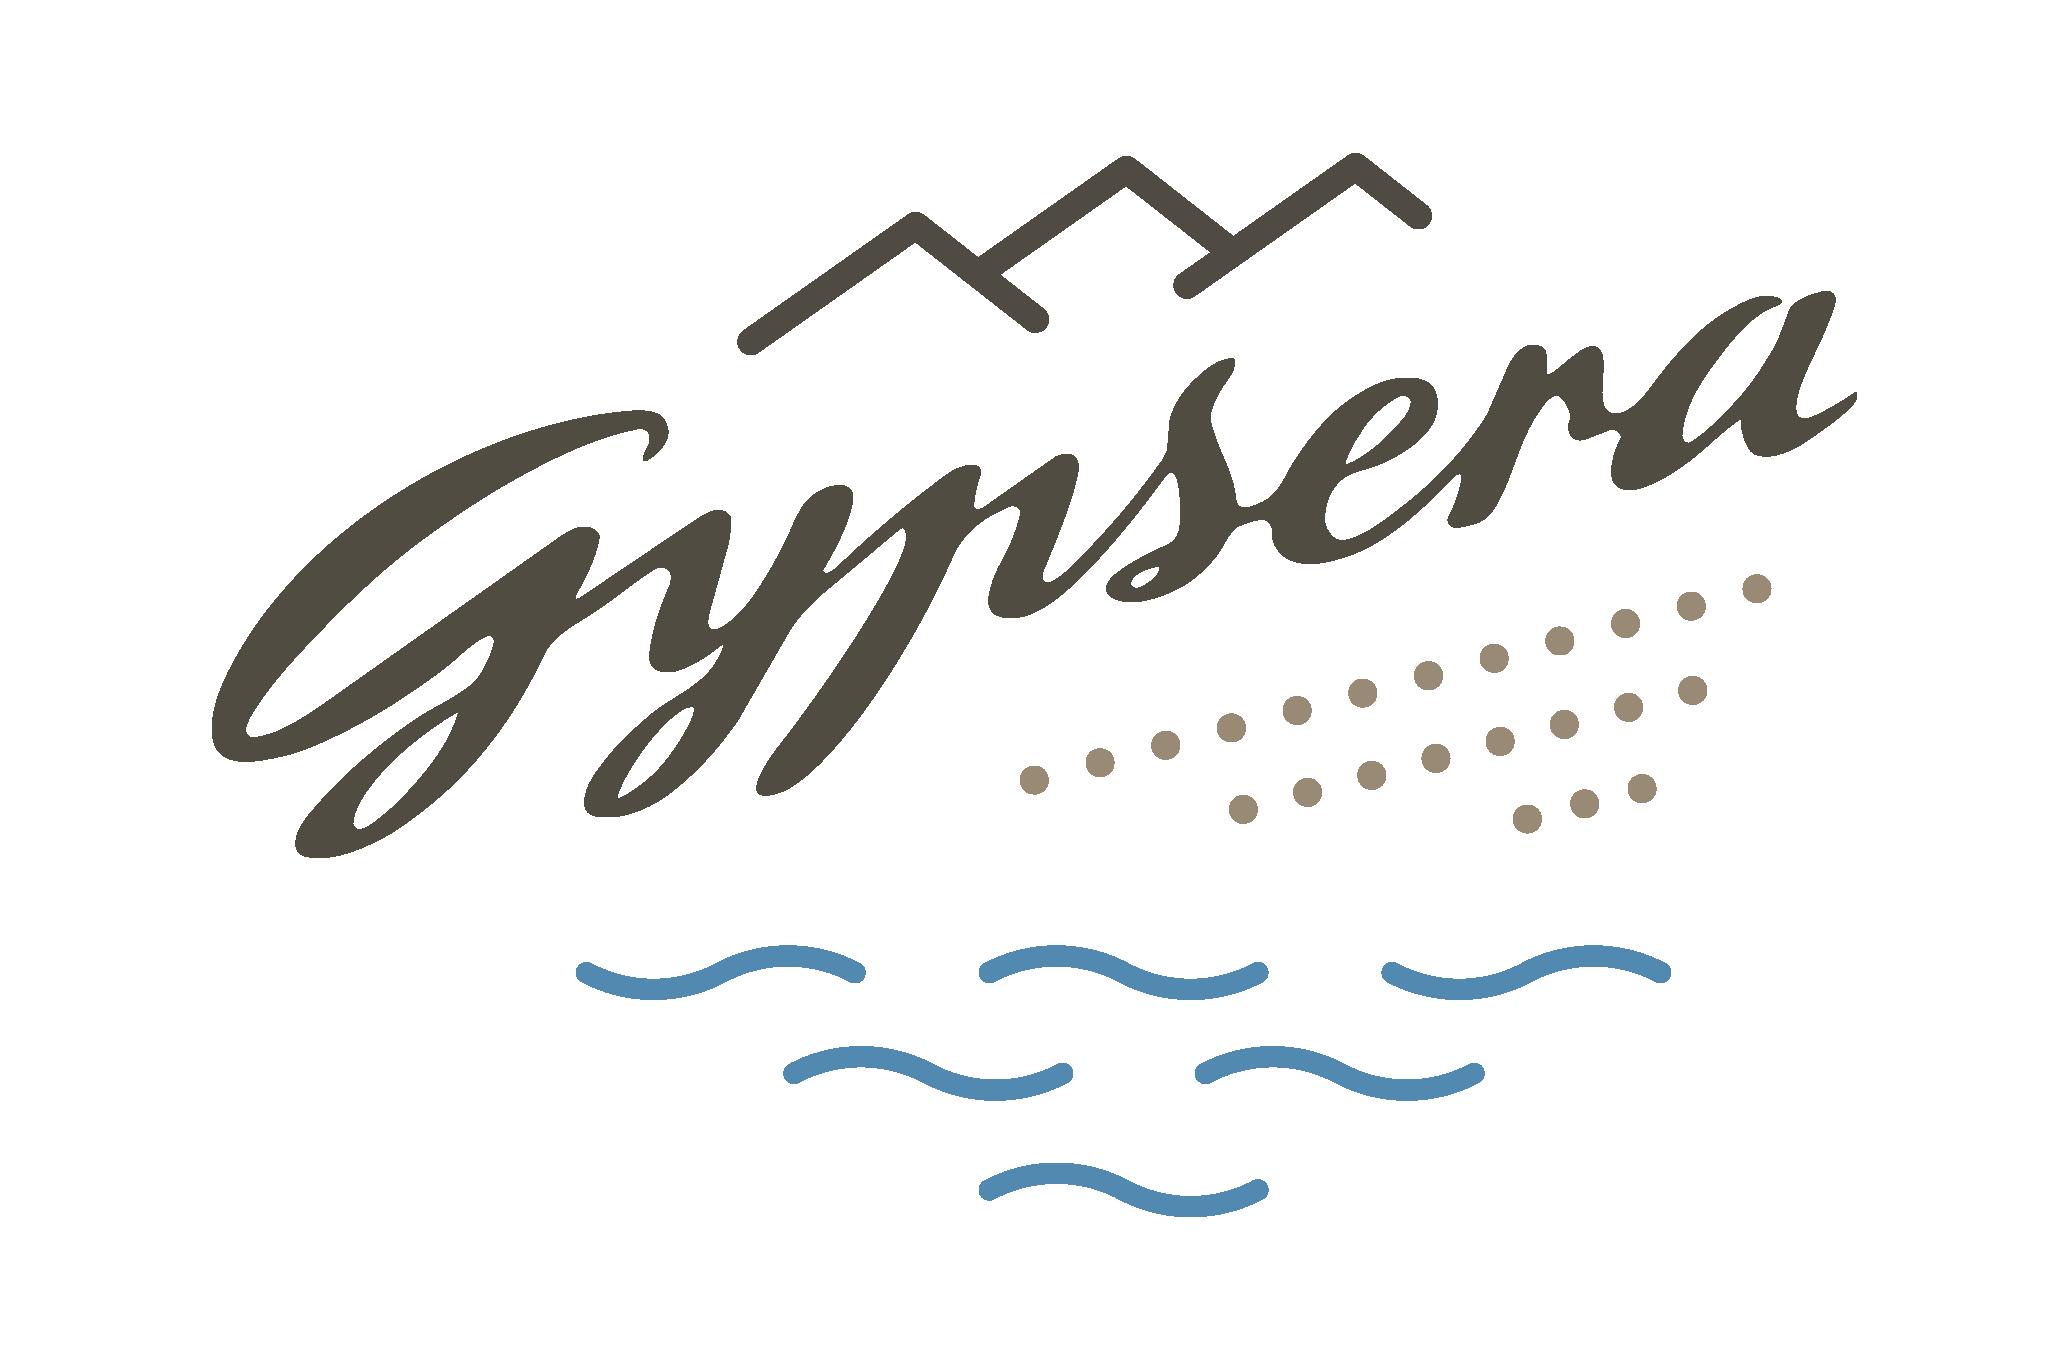 Gypsera